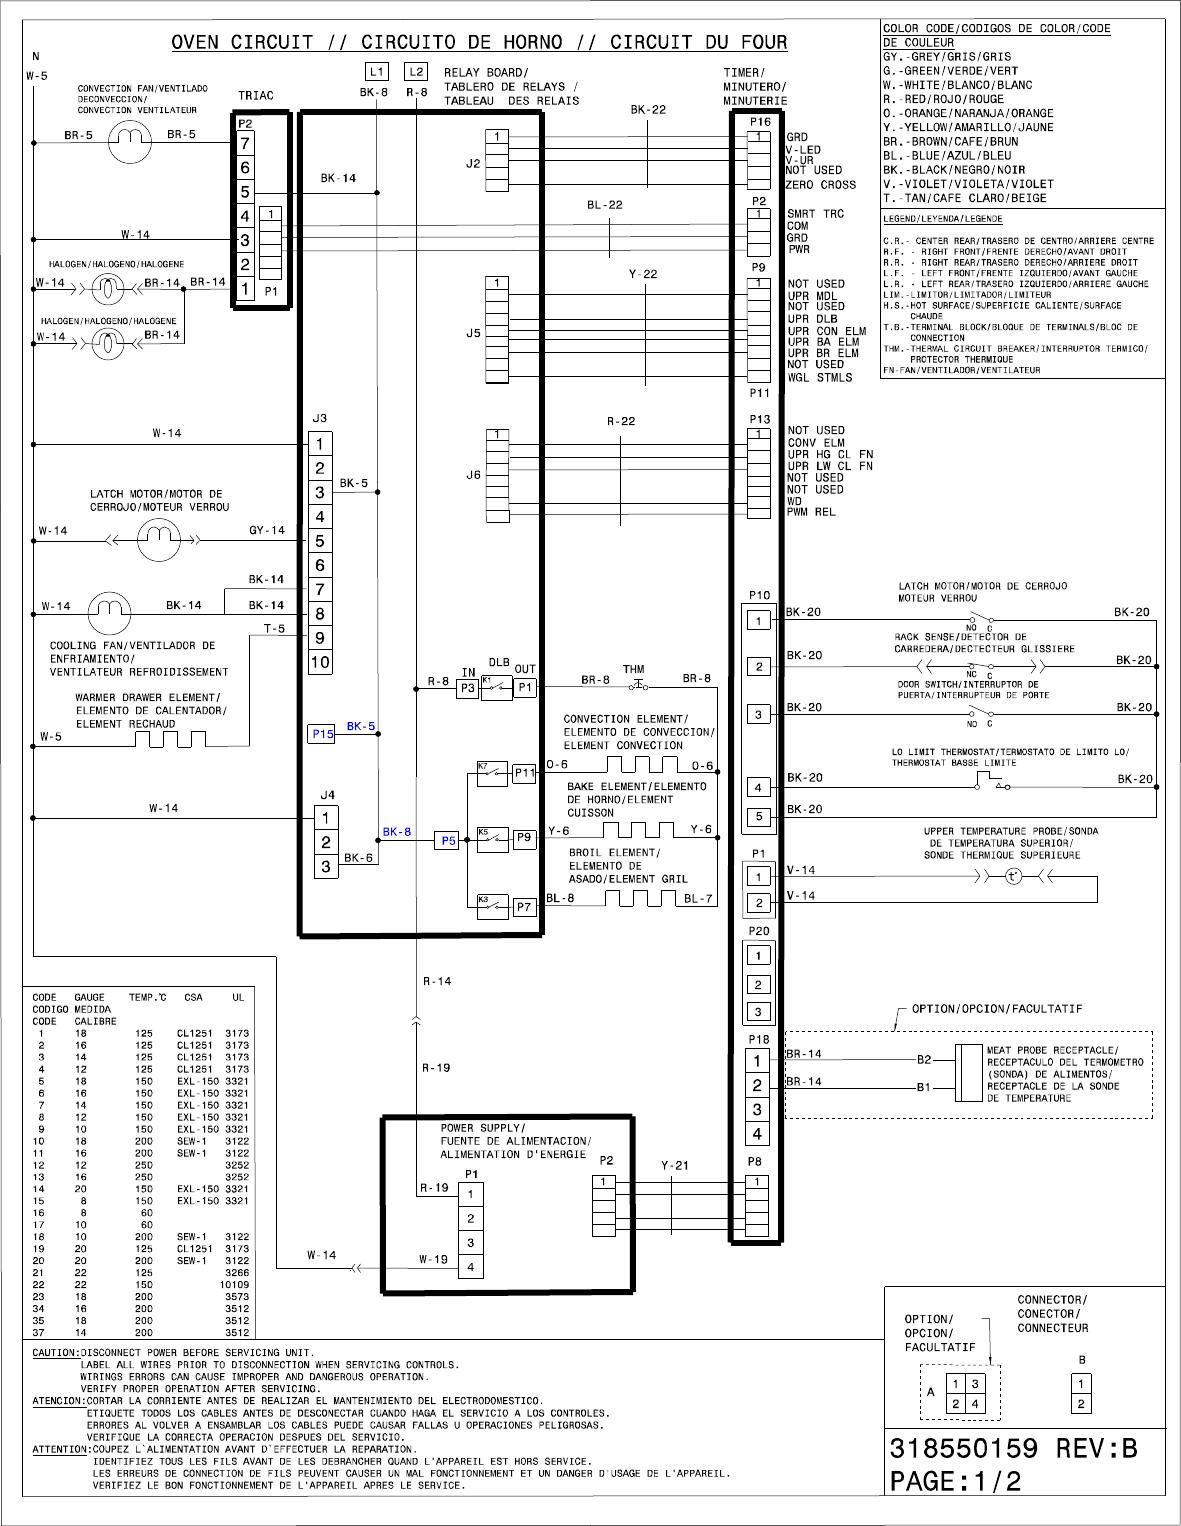 Electrolux 6500 Vacuum Wiring Diagram Electrolux Parts